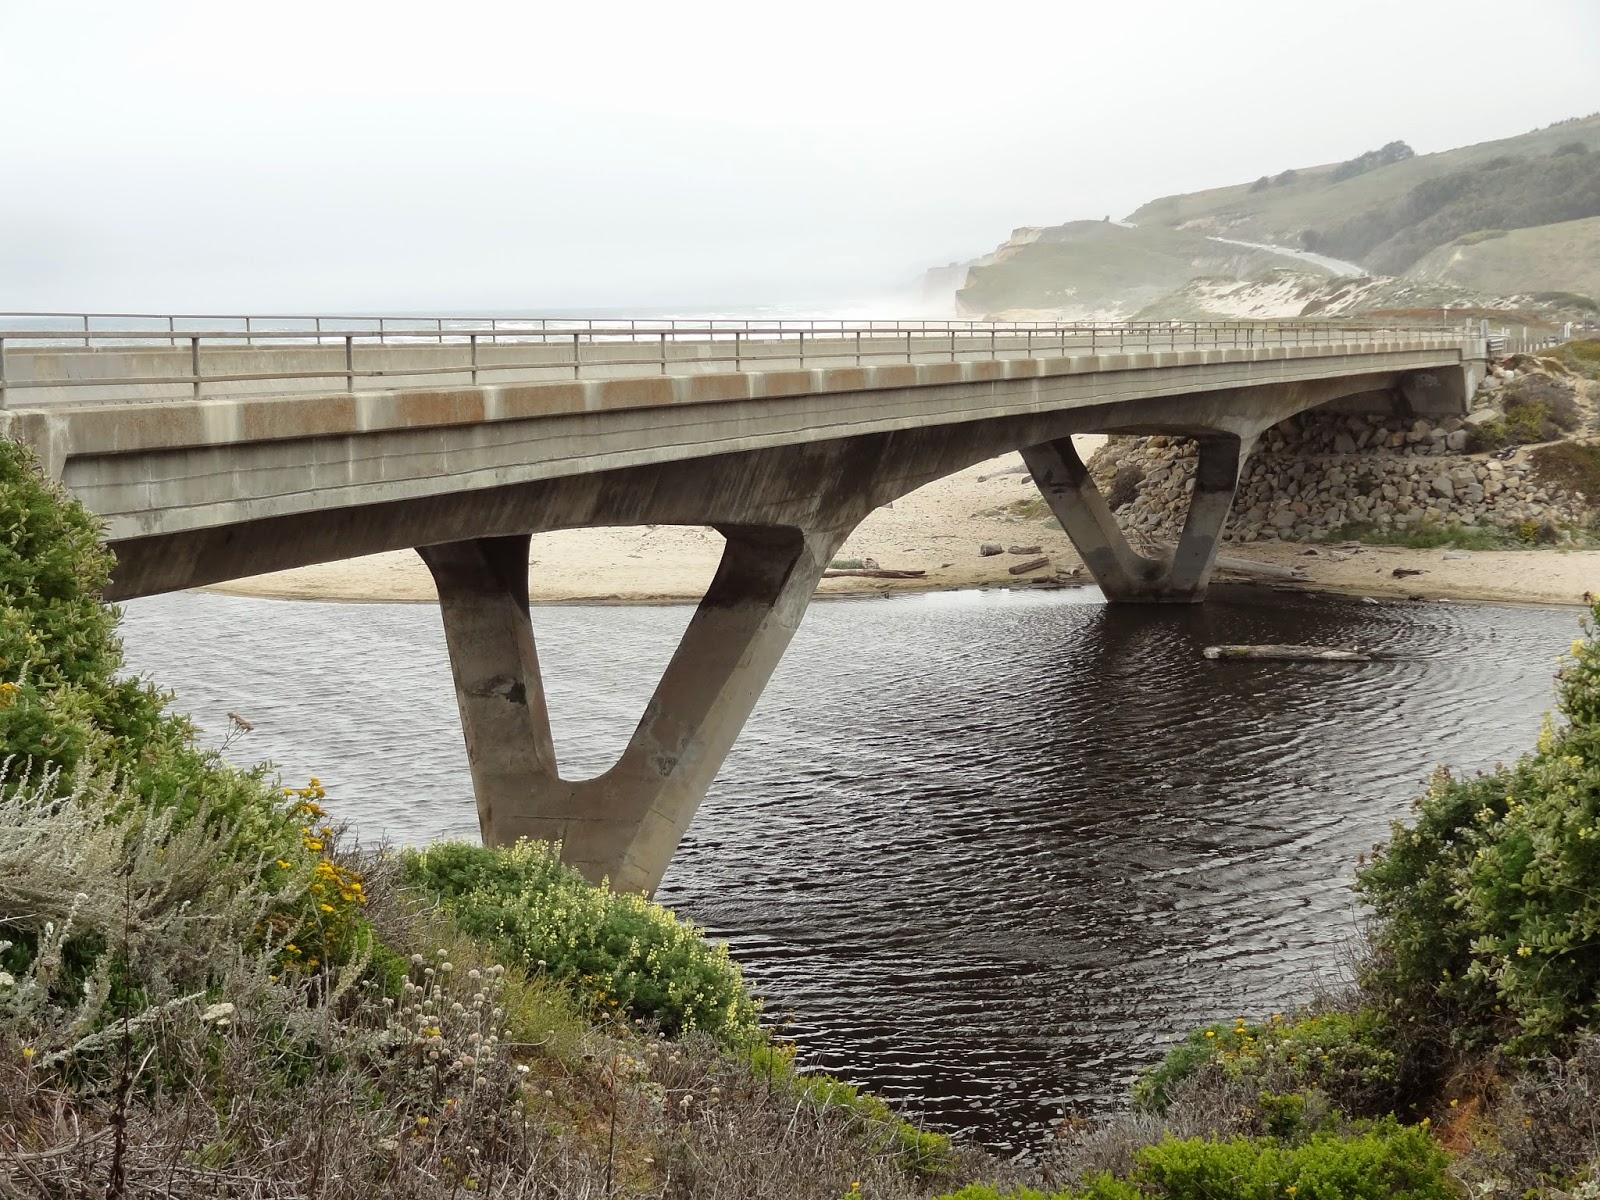 California san mateo county pescadero - San Mateo County California Bridges State Route 1 Across Pescadero Creek 1